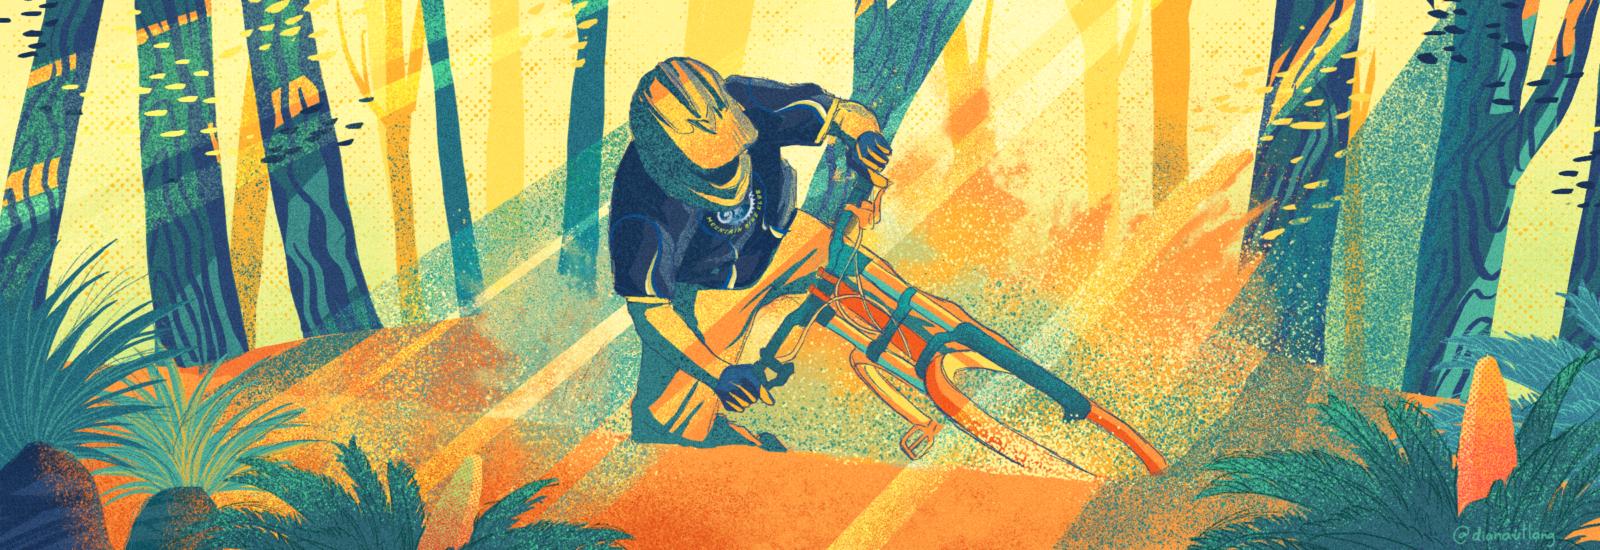 SouthWest Mountain Bike Club